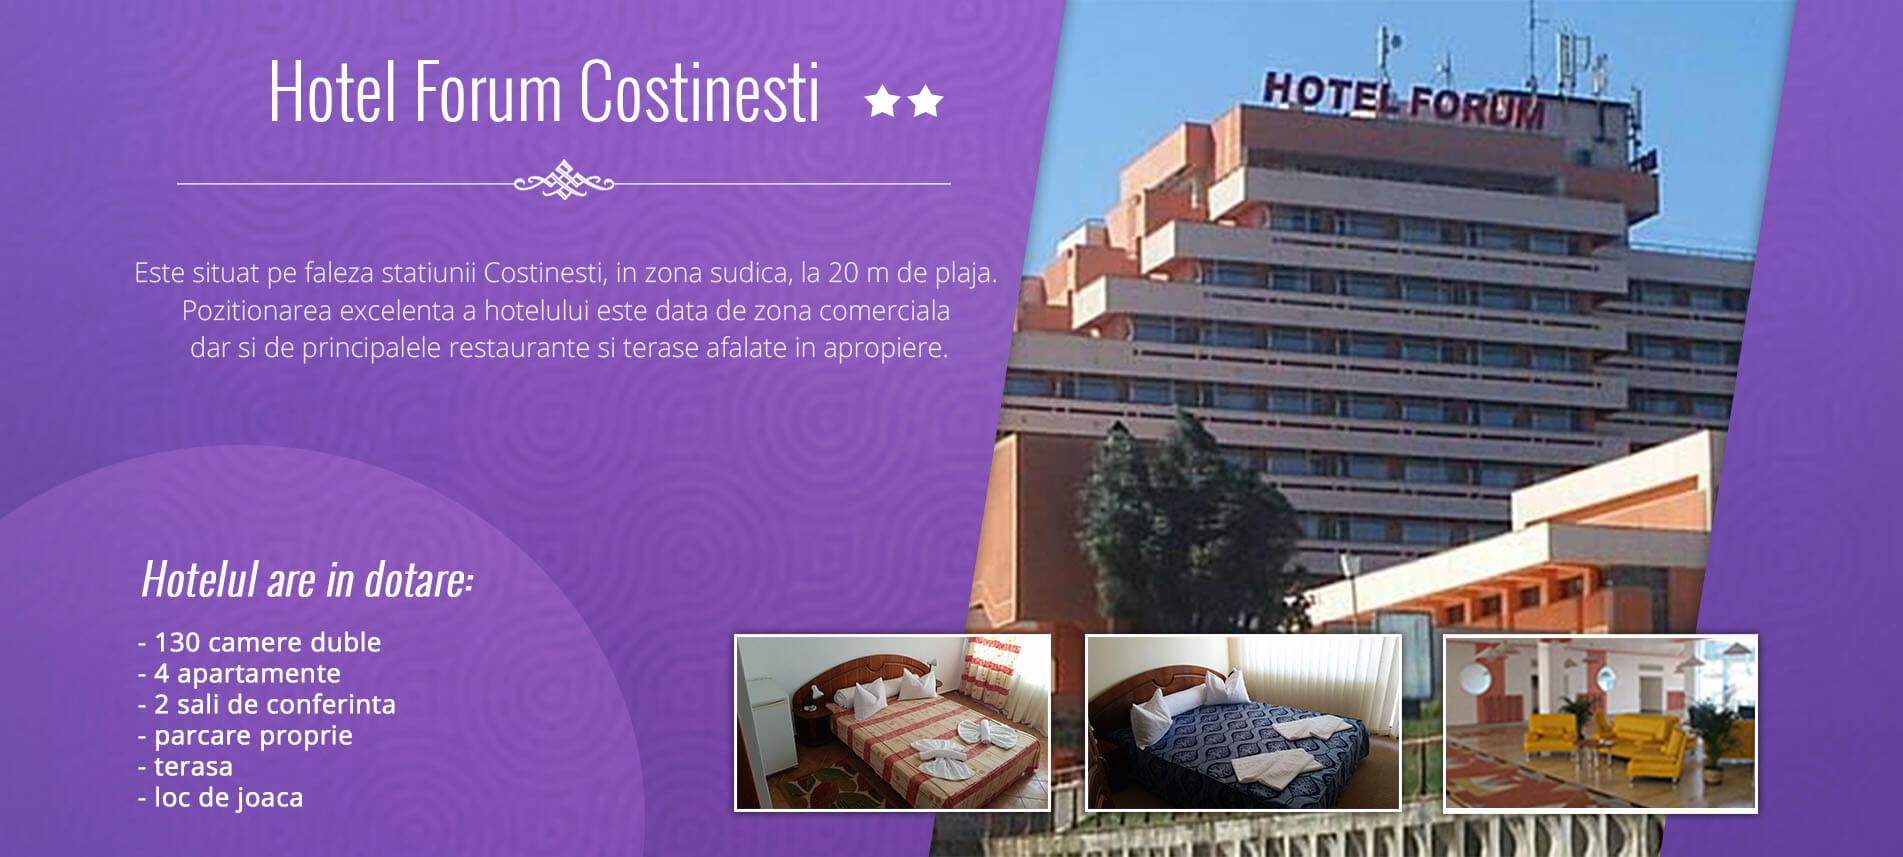 slide home hotel